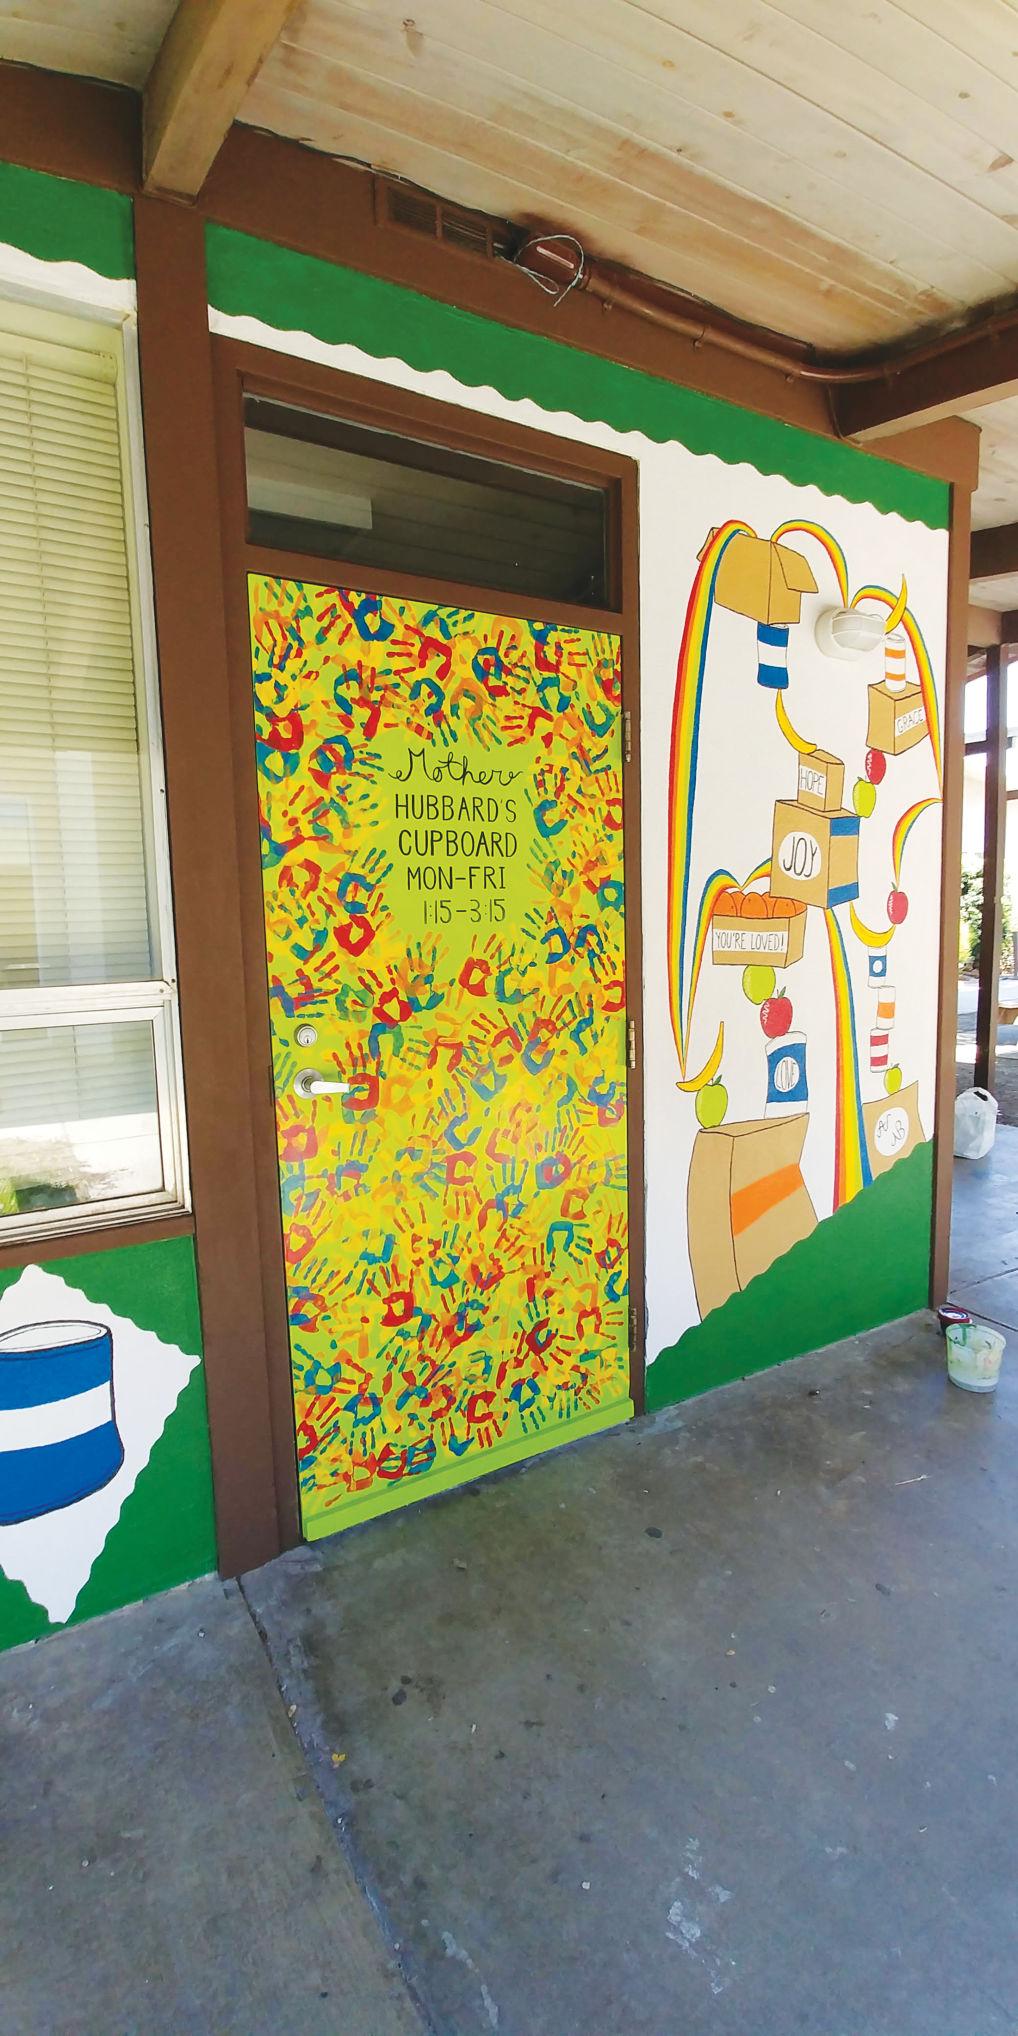 Mother Hubbard's Cupboard mural